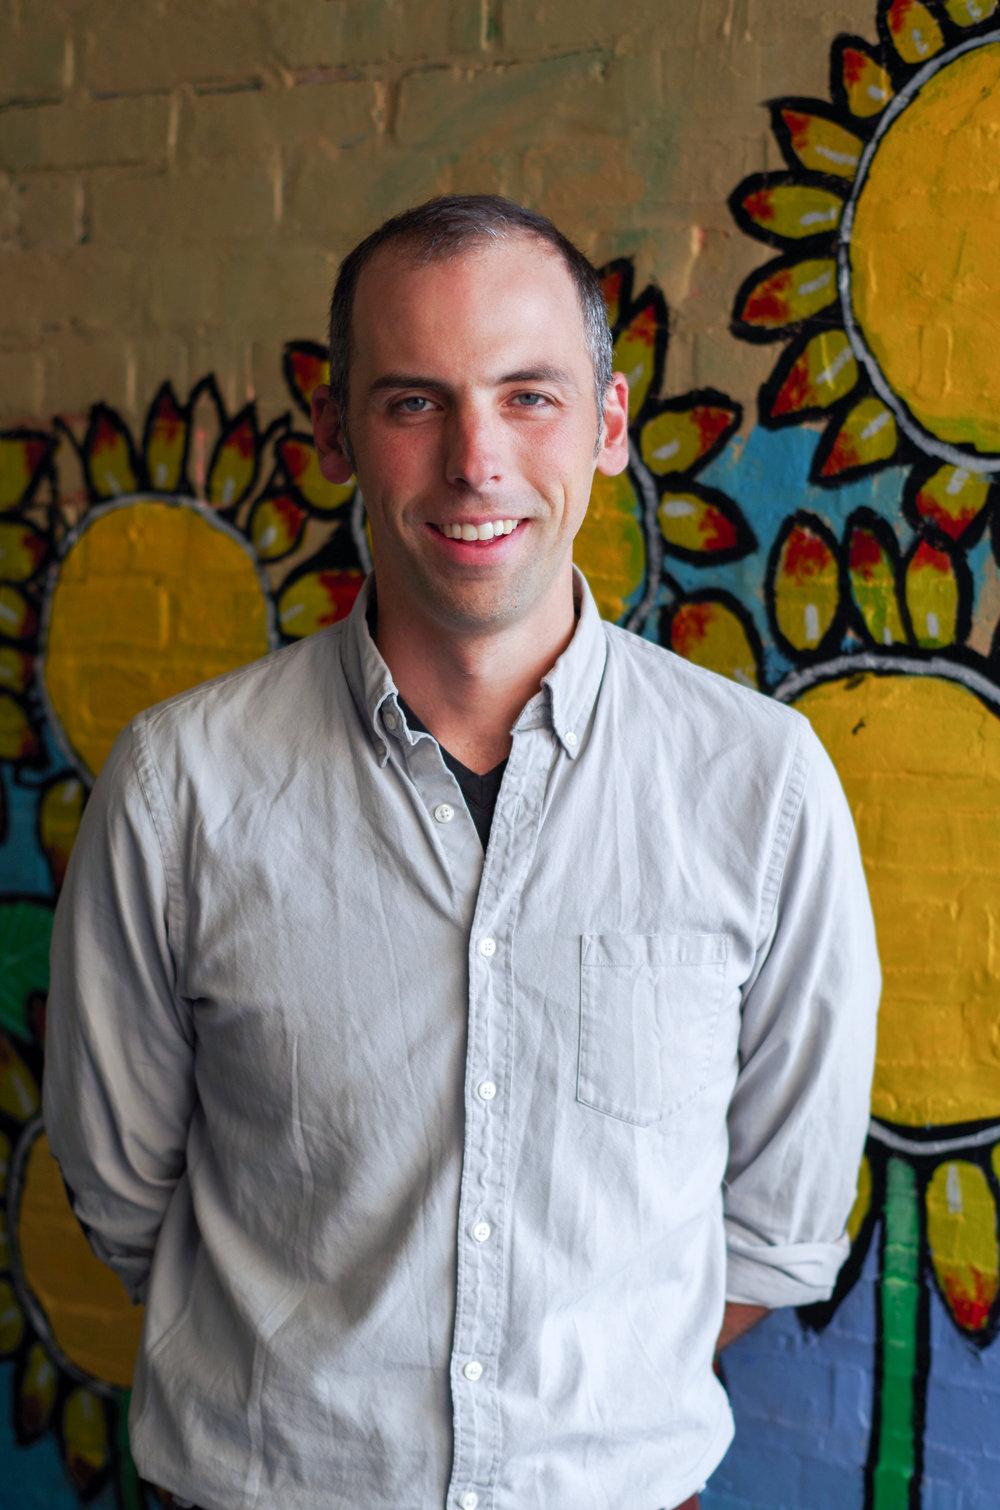 Matt Allison